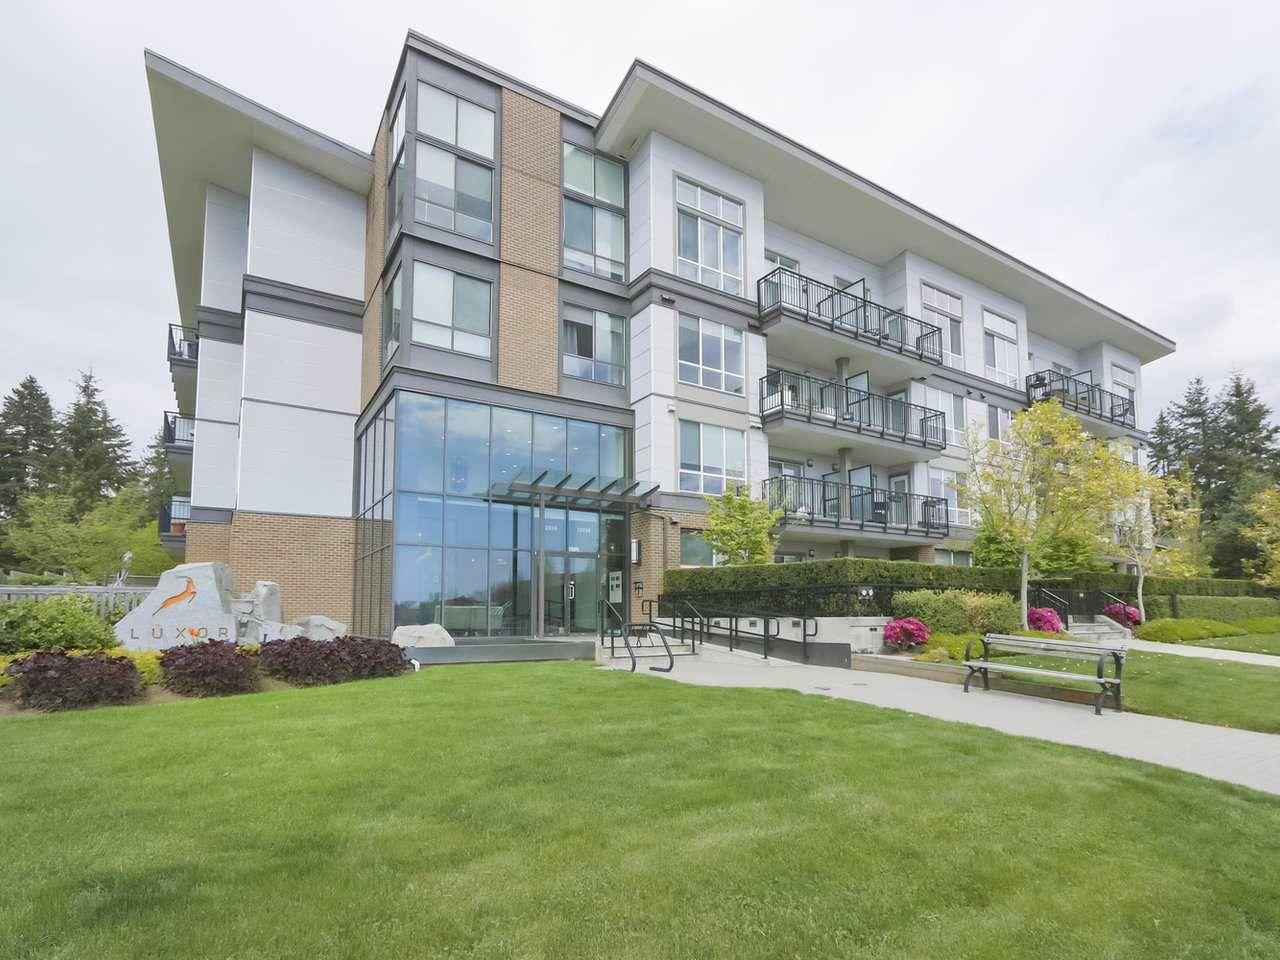 Main Photo: 426 12039 64 Avenue in Surrey: West Newton Condo for sale : MLS®# R2369916